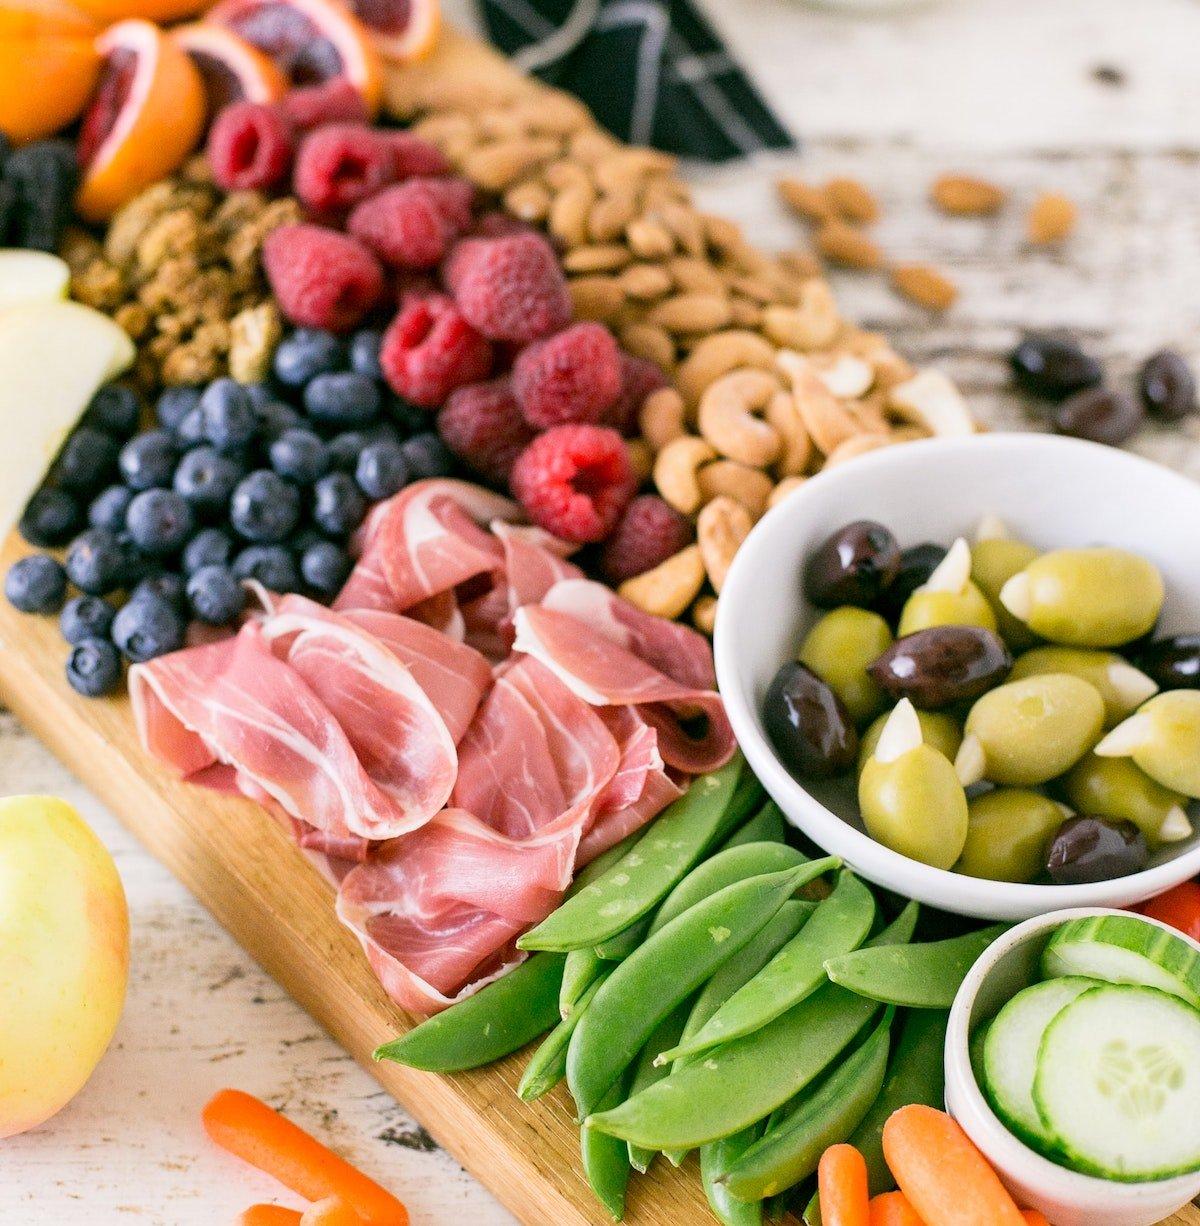 paleo vs other diets